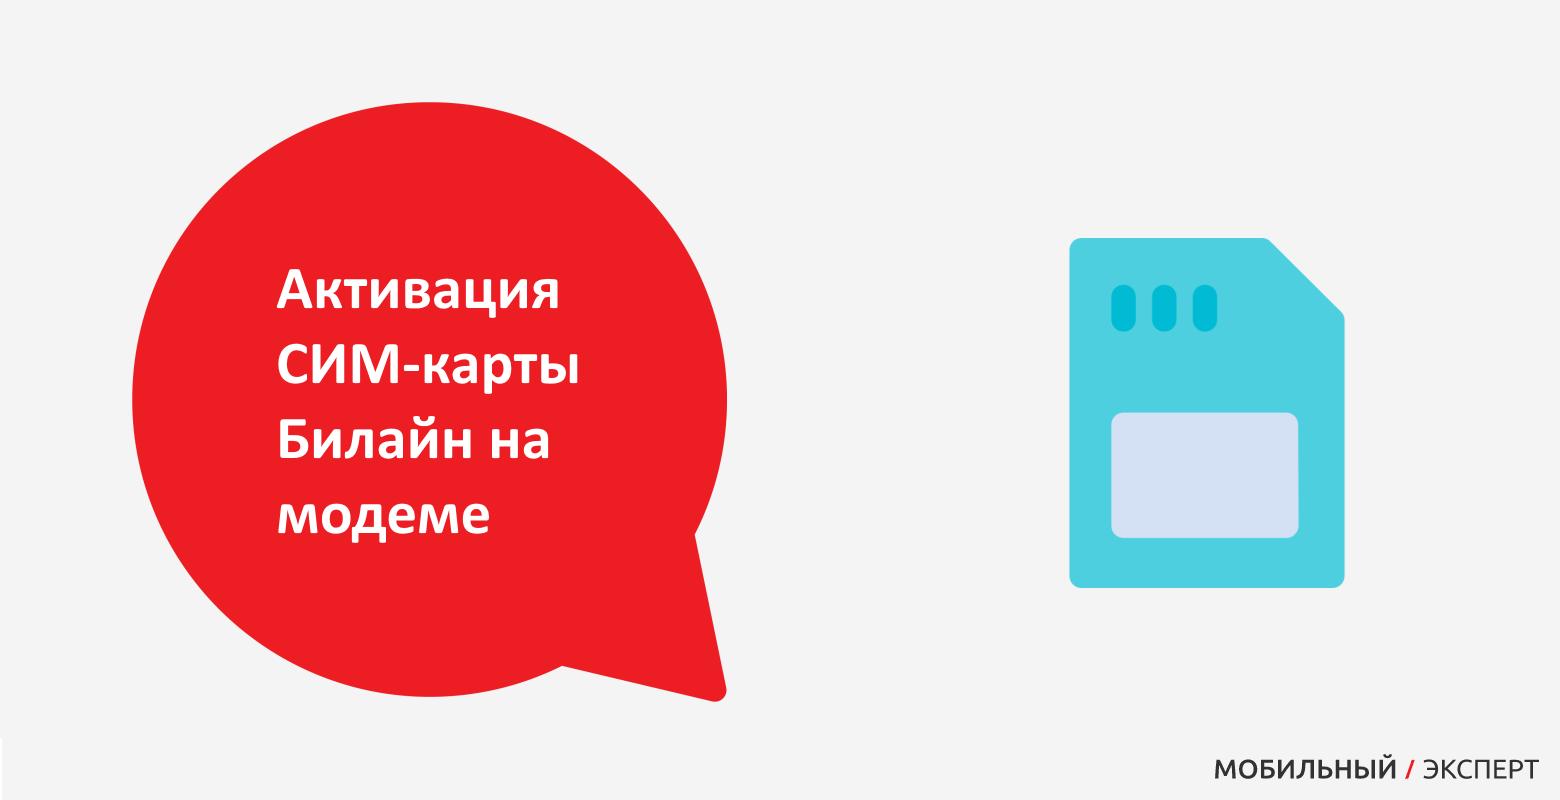 Активация СИМ-карты на модеме